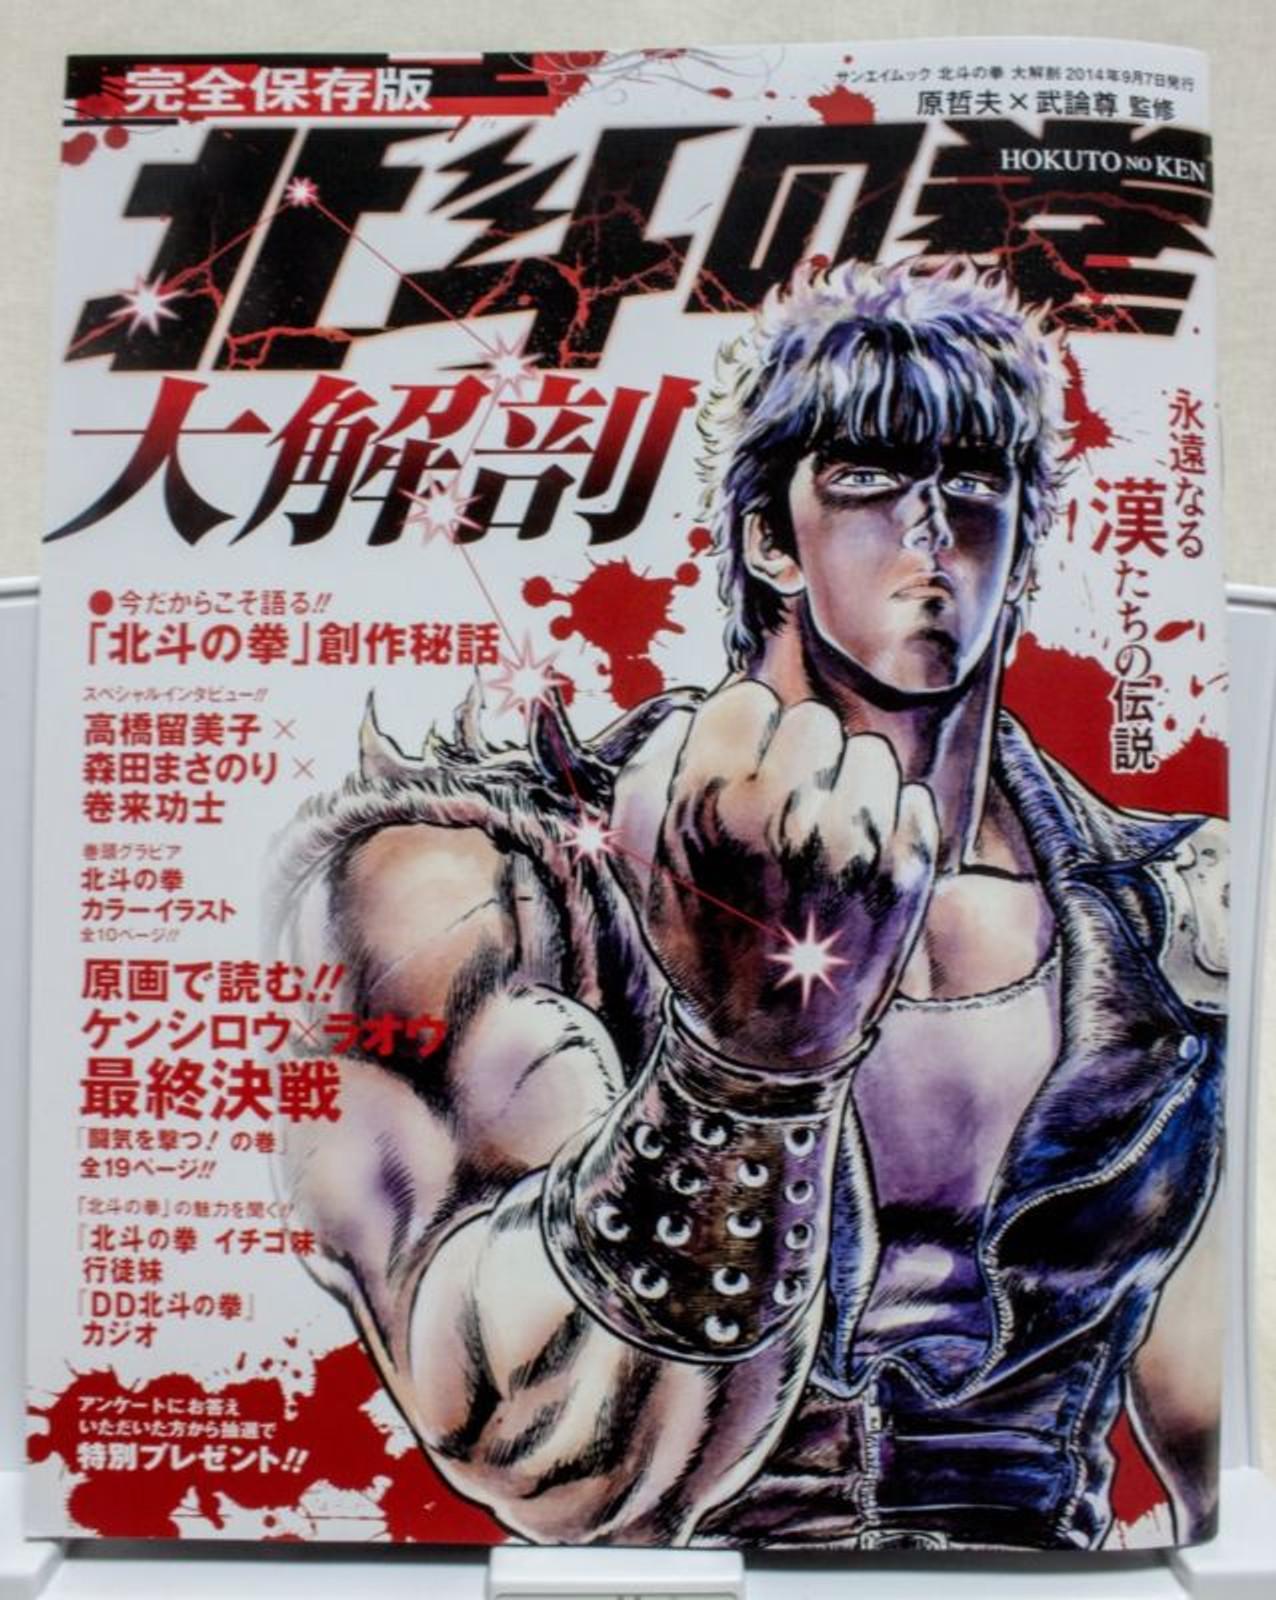 Fist of the North Star Illustration Art Magazine Hokuto no Ken JAPAN ANIME MANGA